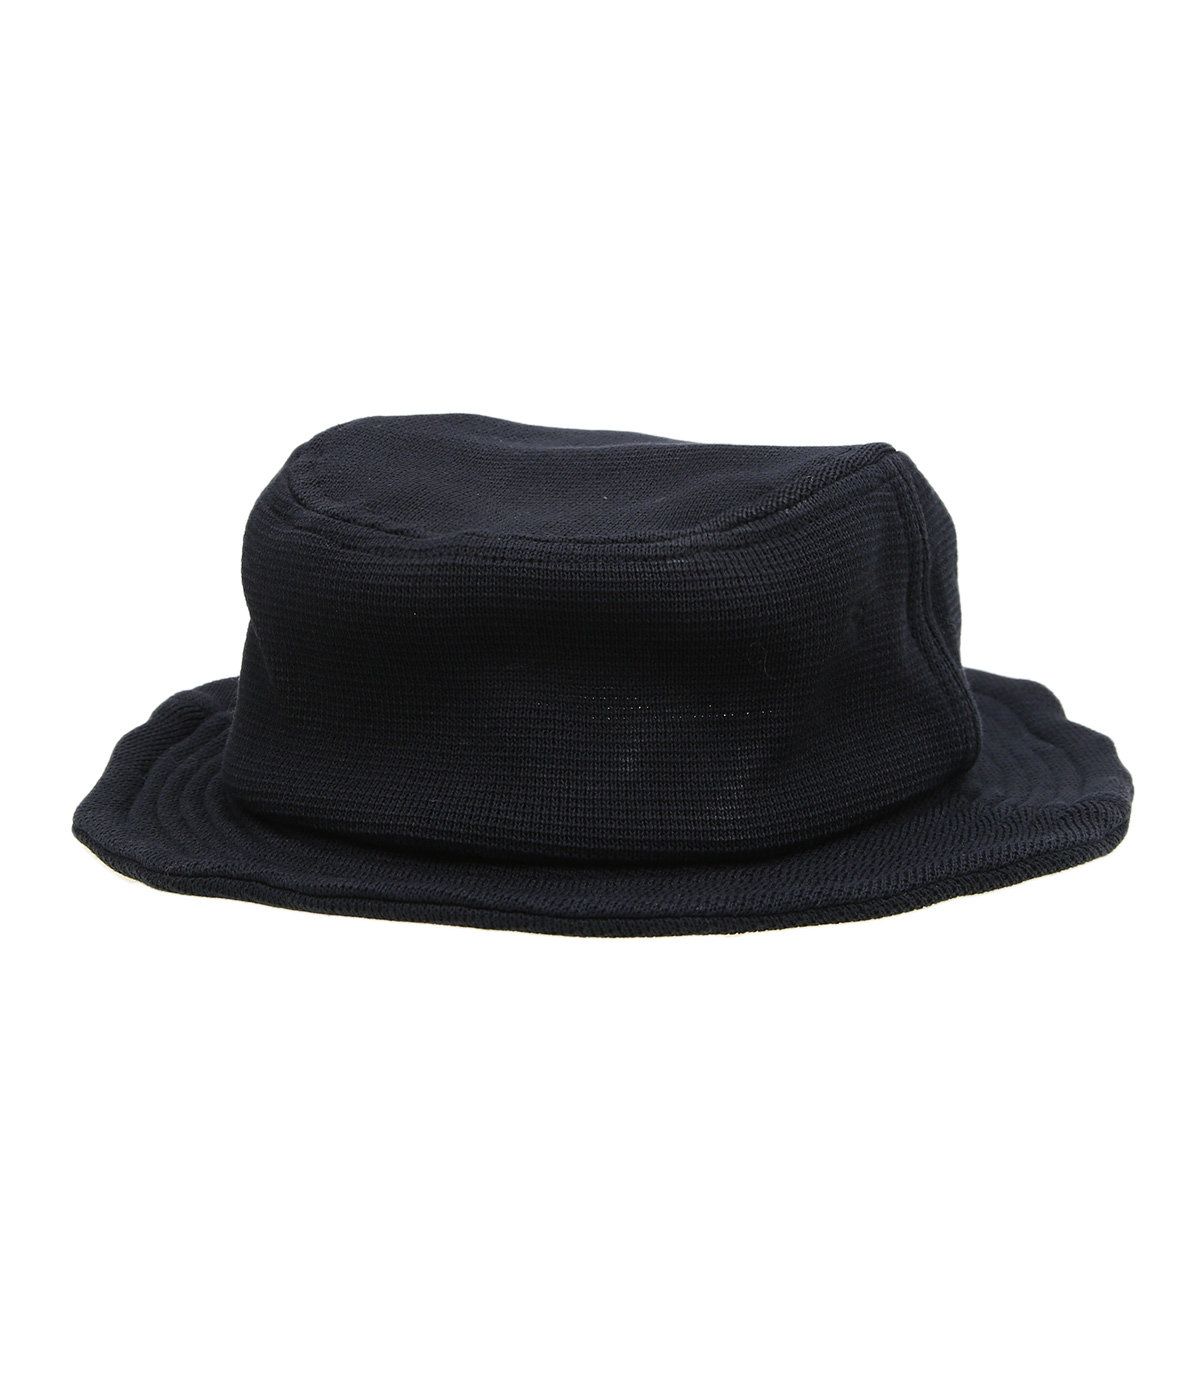 【ONLY ARK】別注 PORK PIE HAT